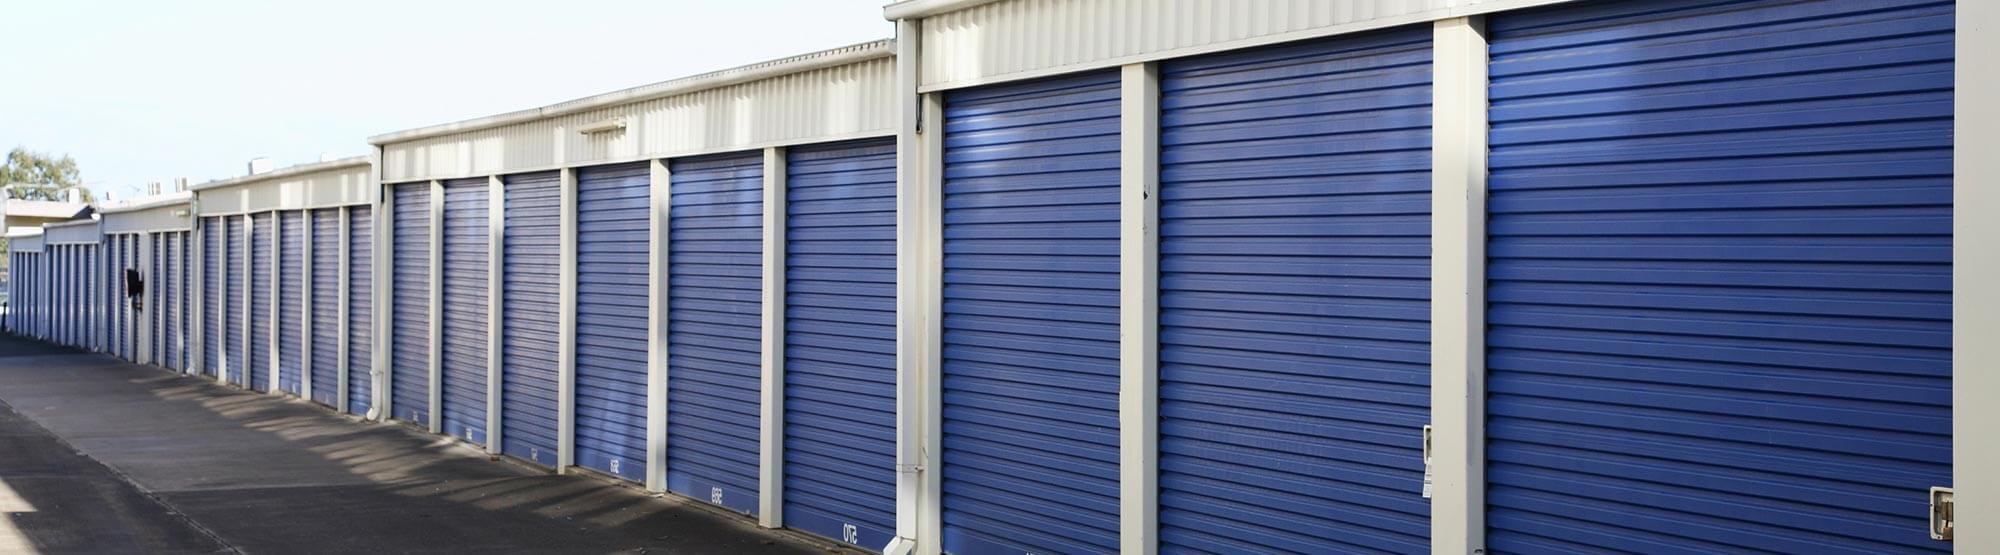 Morro Bay Storage Units